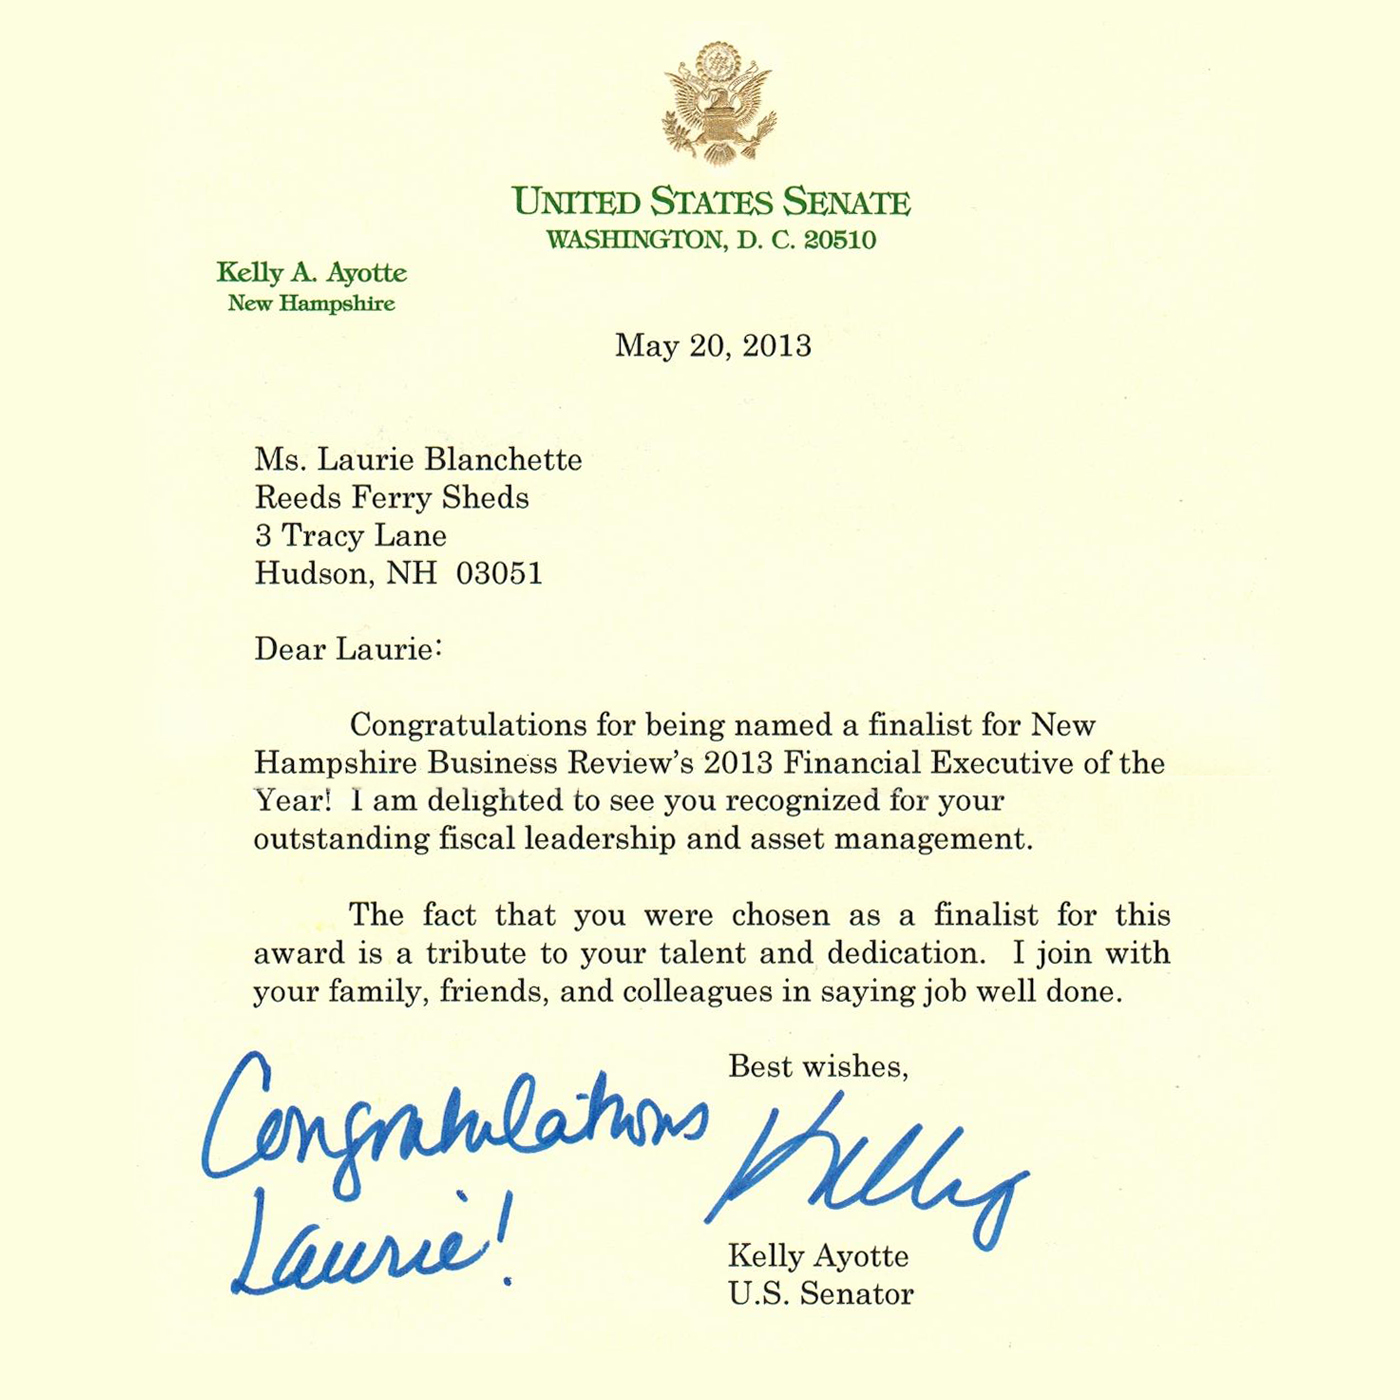 Letter from Senator Ayotte